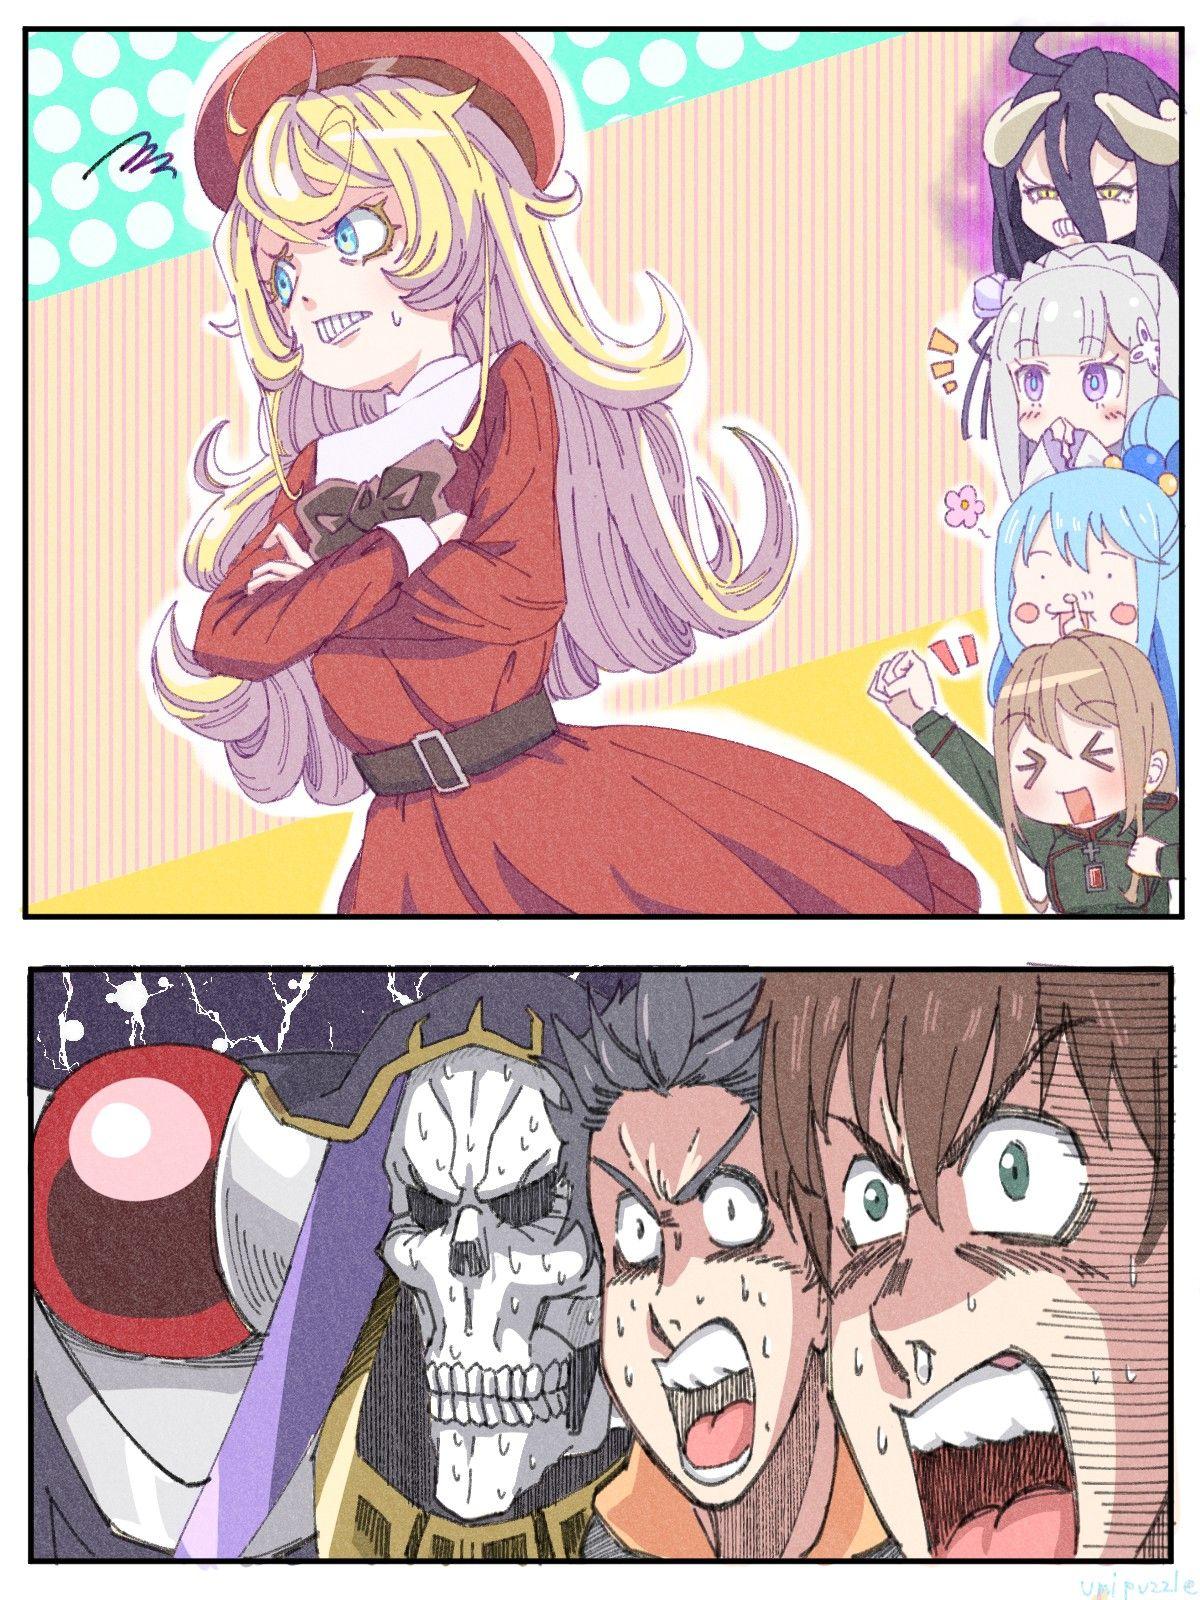 Pin by Uwu Uwu. on uwu Anime, Anime funny, Anime crossover